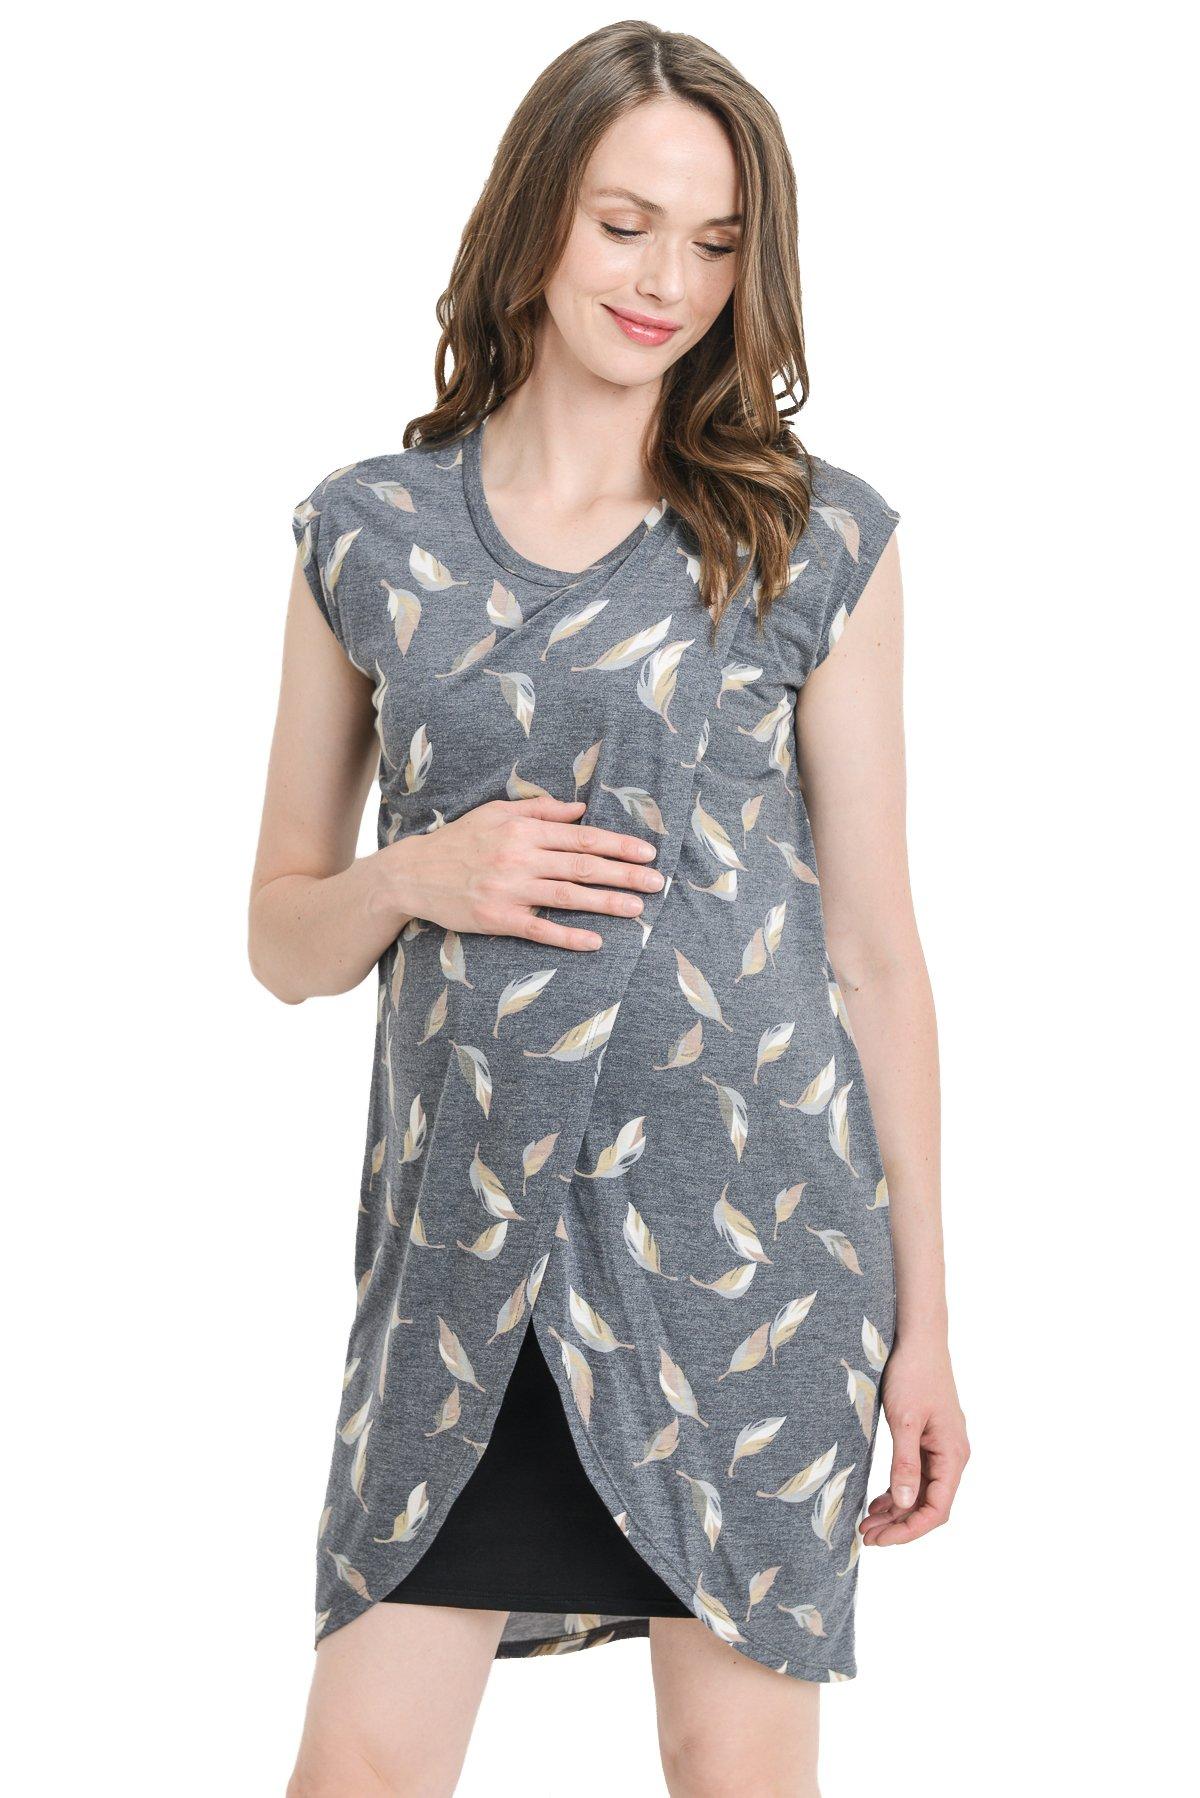 Hello MIZ Color Block Asymmetrical Breastfeeing Maternity Nursing Dress (Large,Navy/Black)